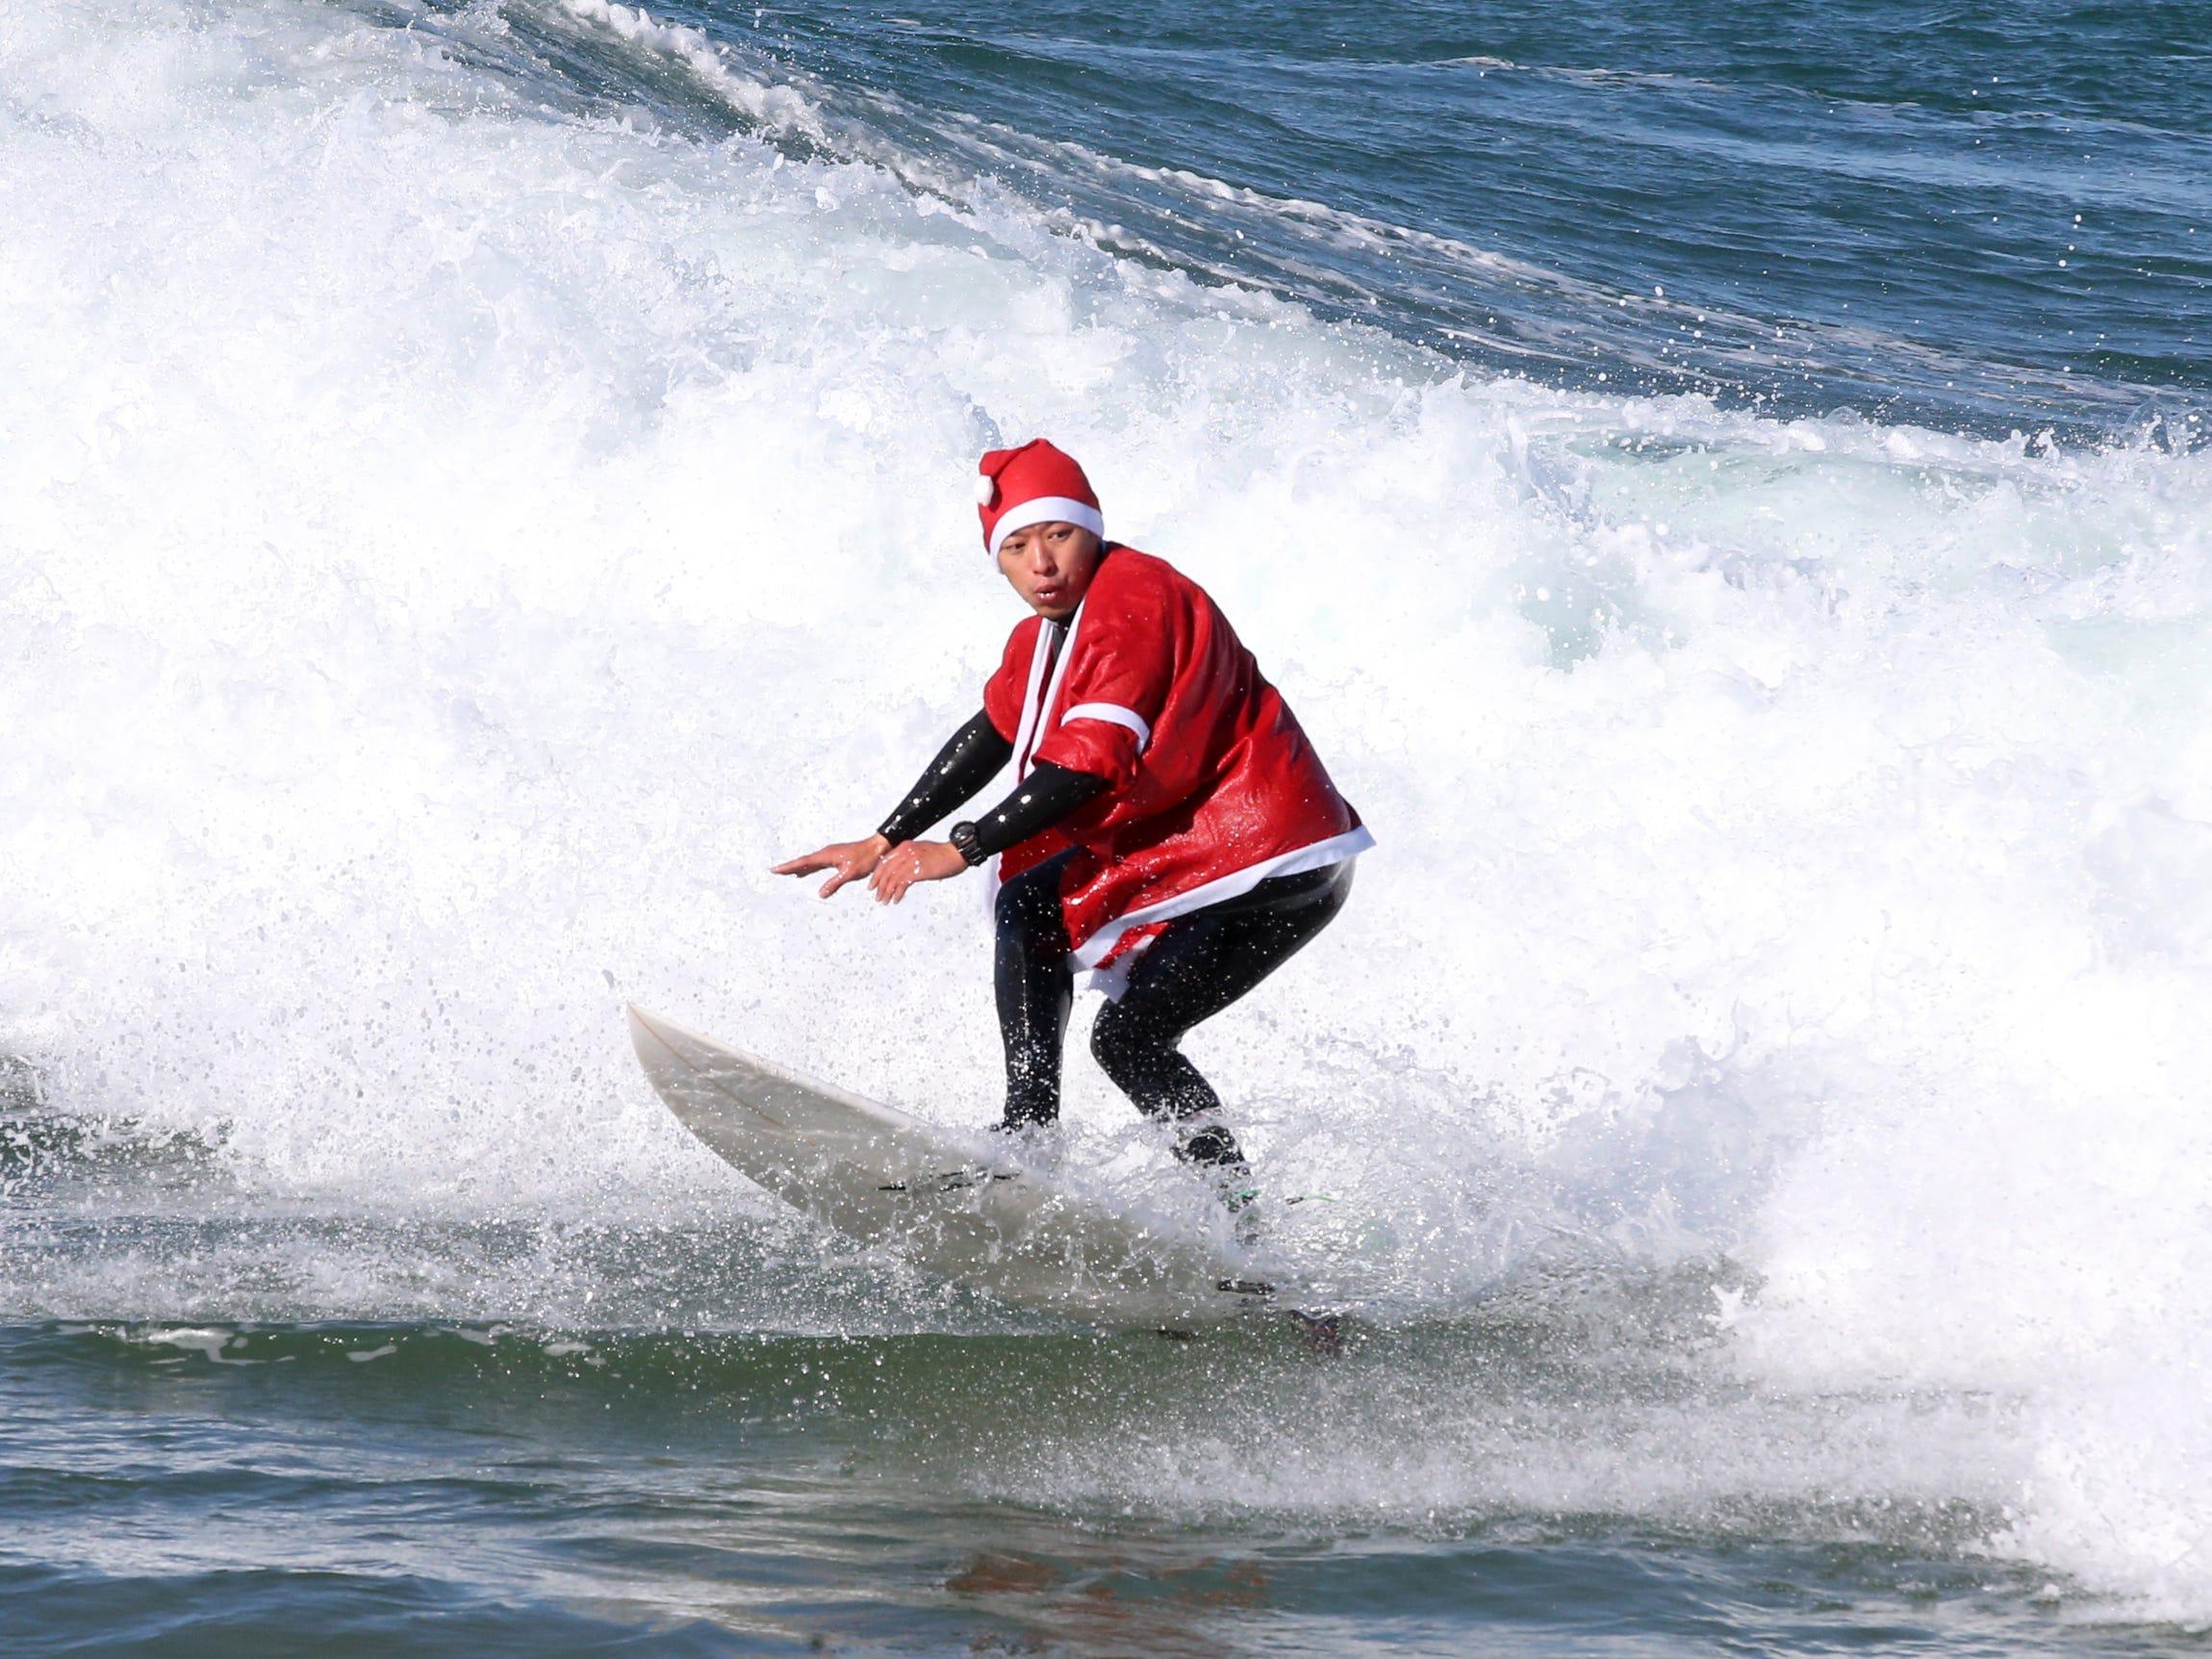 epa07247251 A surfer dressed as Santa Claus rides a wave near Pohang, 375 kilometers southeast of Seoul, South Korea, 24 December 2018.  EPA-EFE/YONHAP SOUTH KOREA OUT